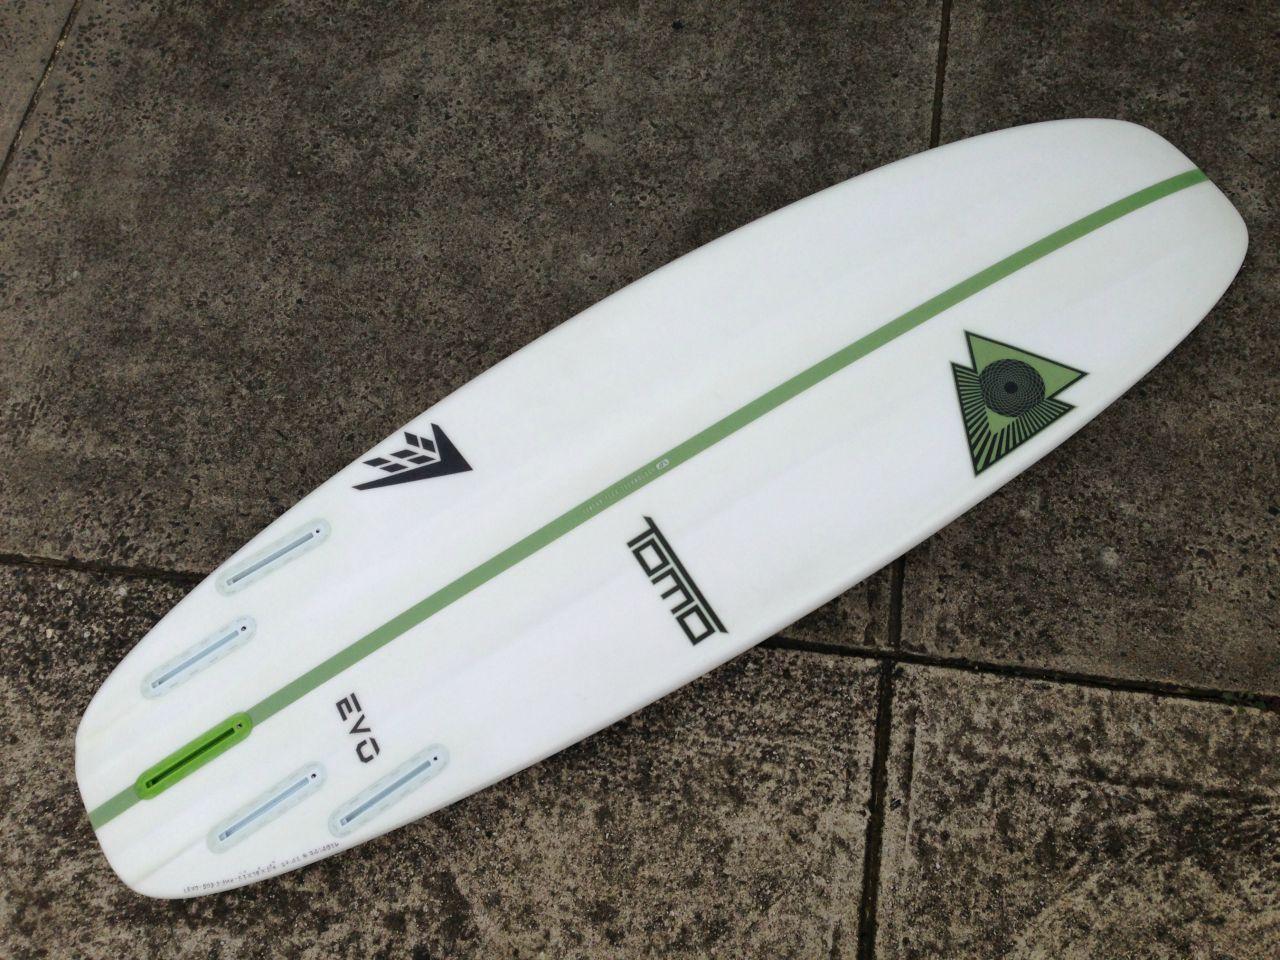 Demo Surfboards Firewire Tomo Evo